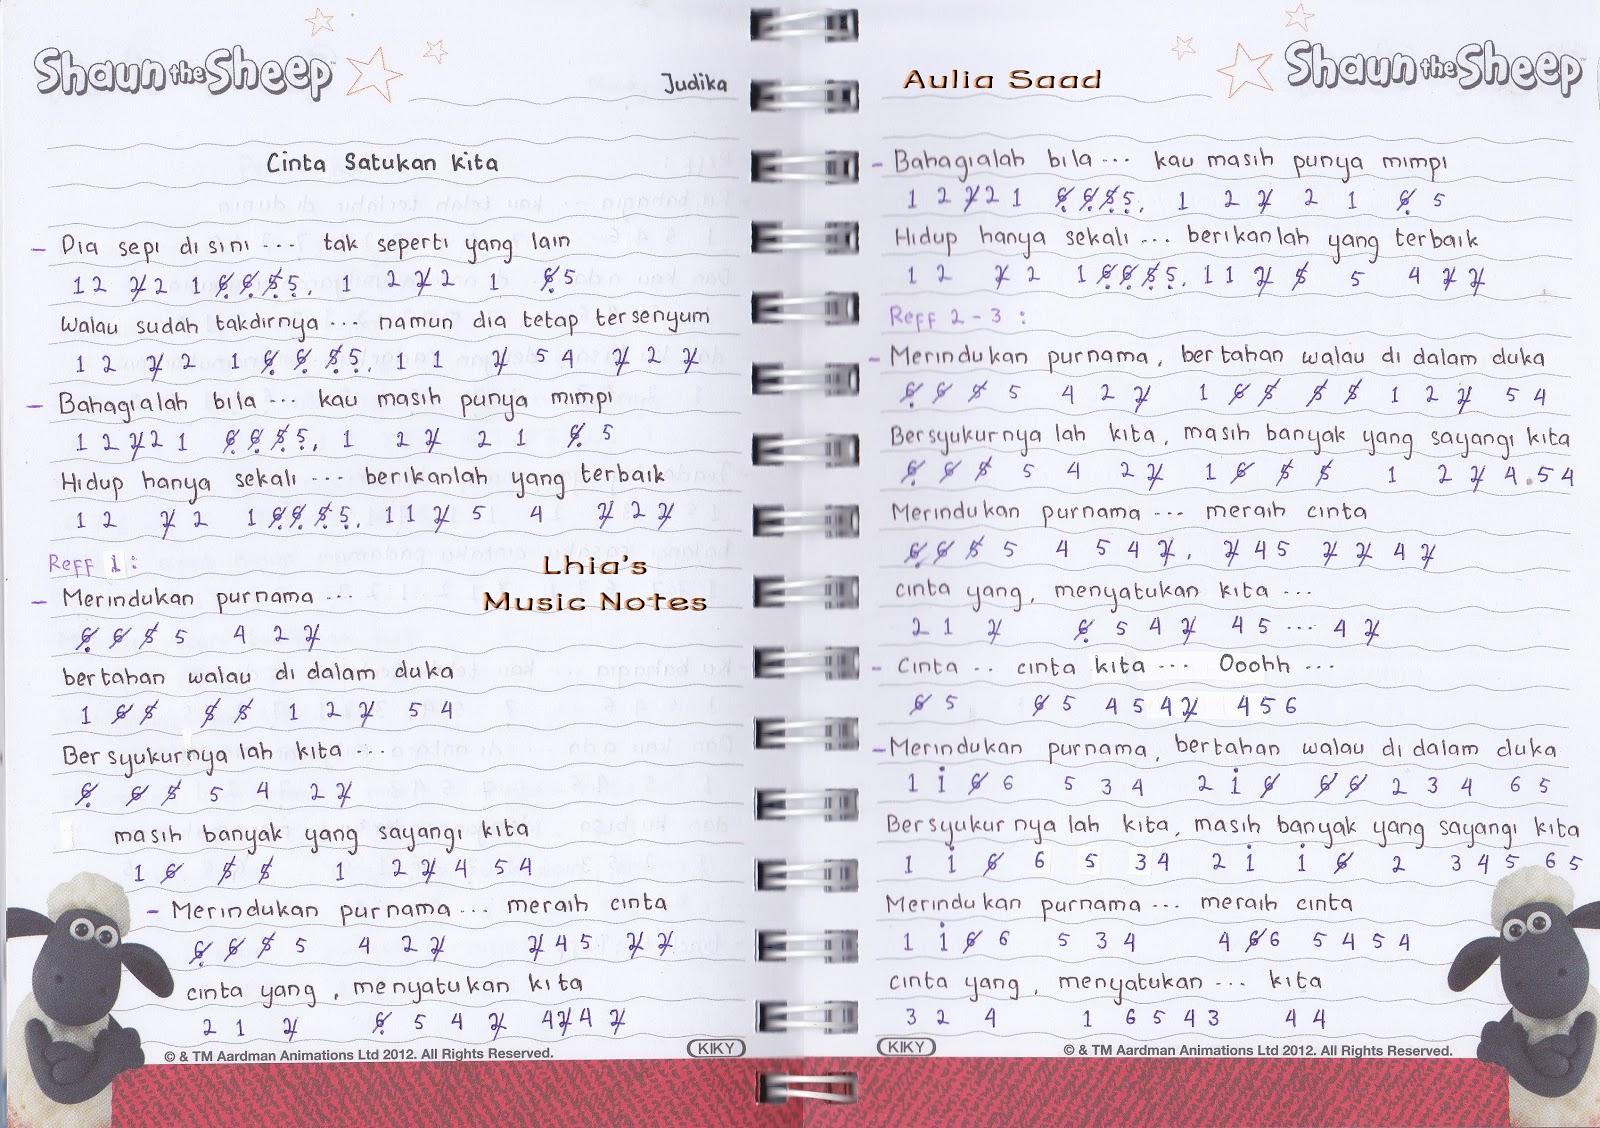 Energian Saastothese Surat Cinta Starla Lirik Chord